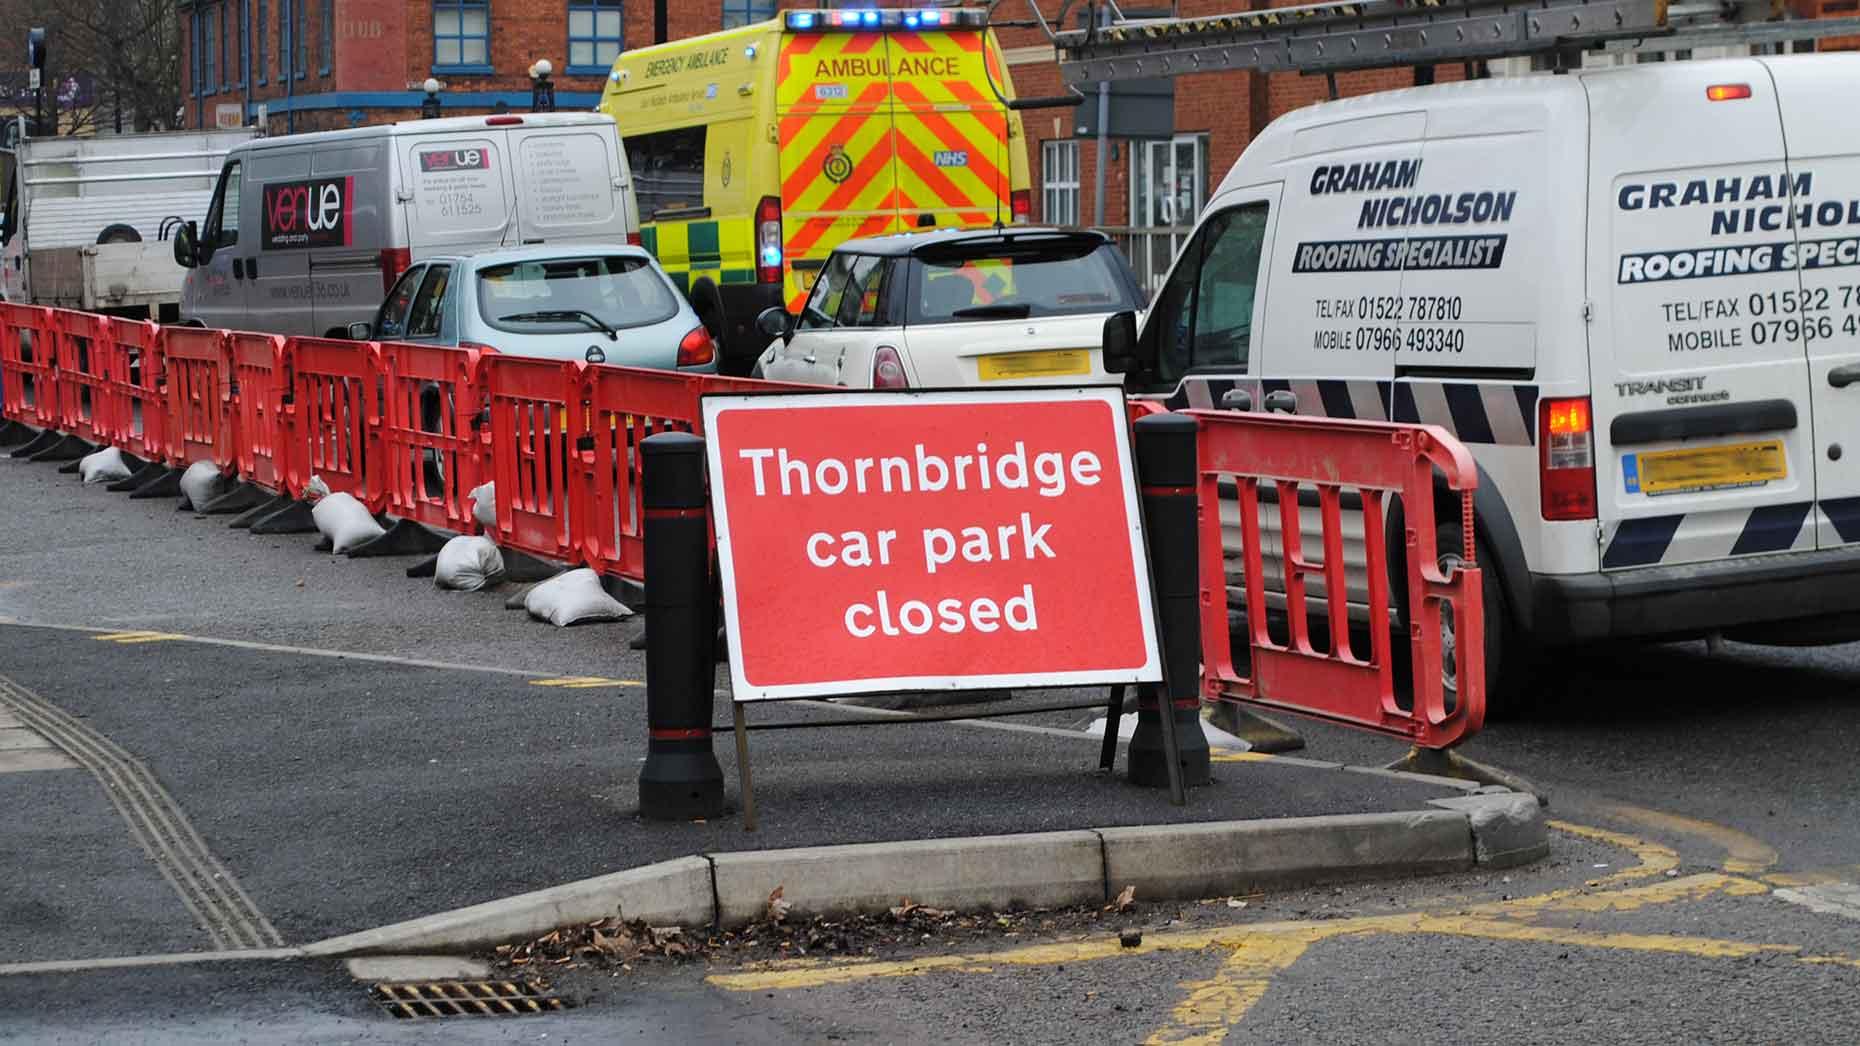 Thornbridge car park